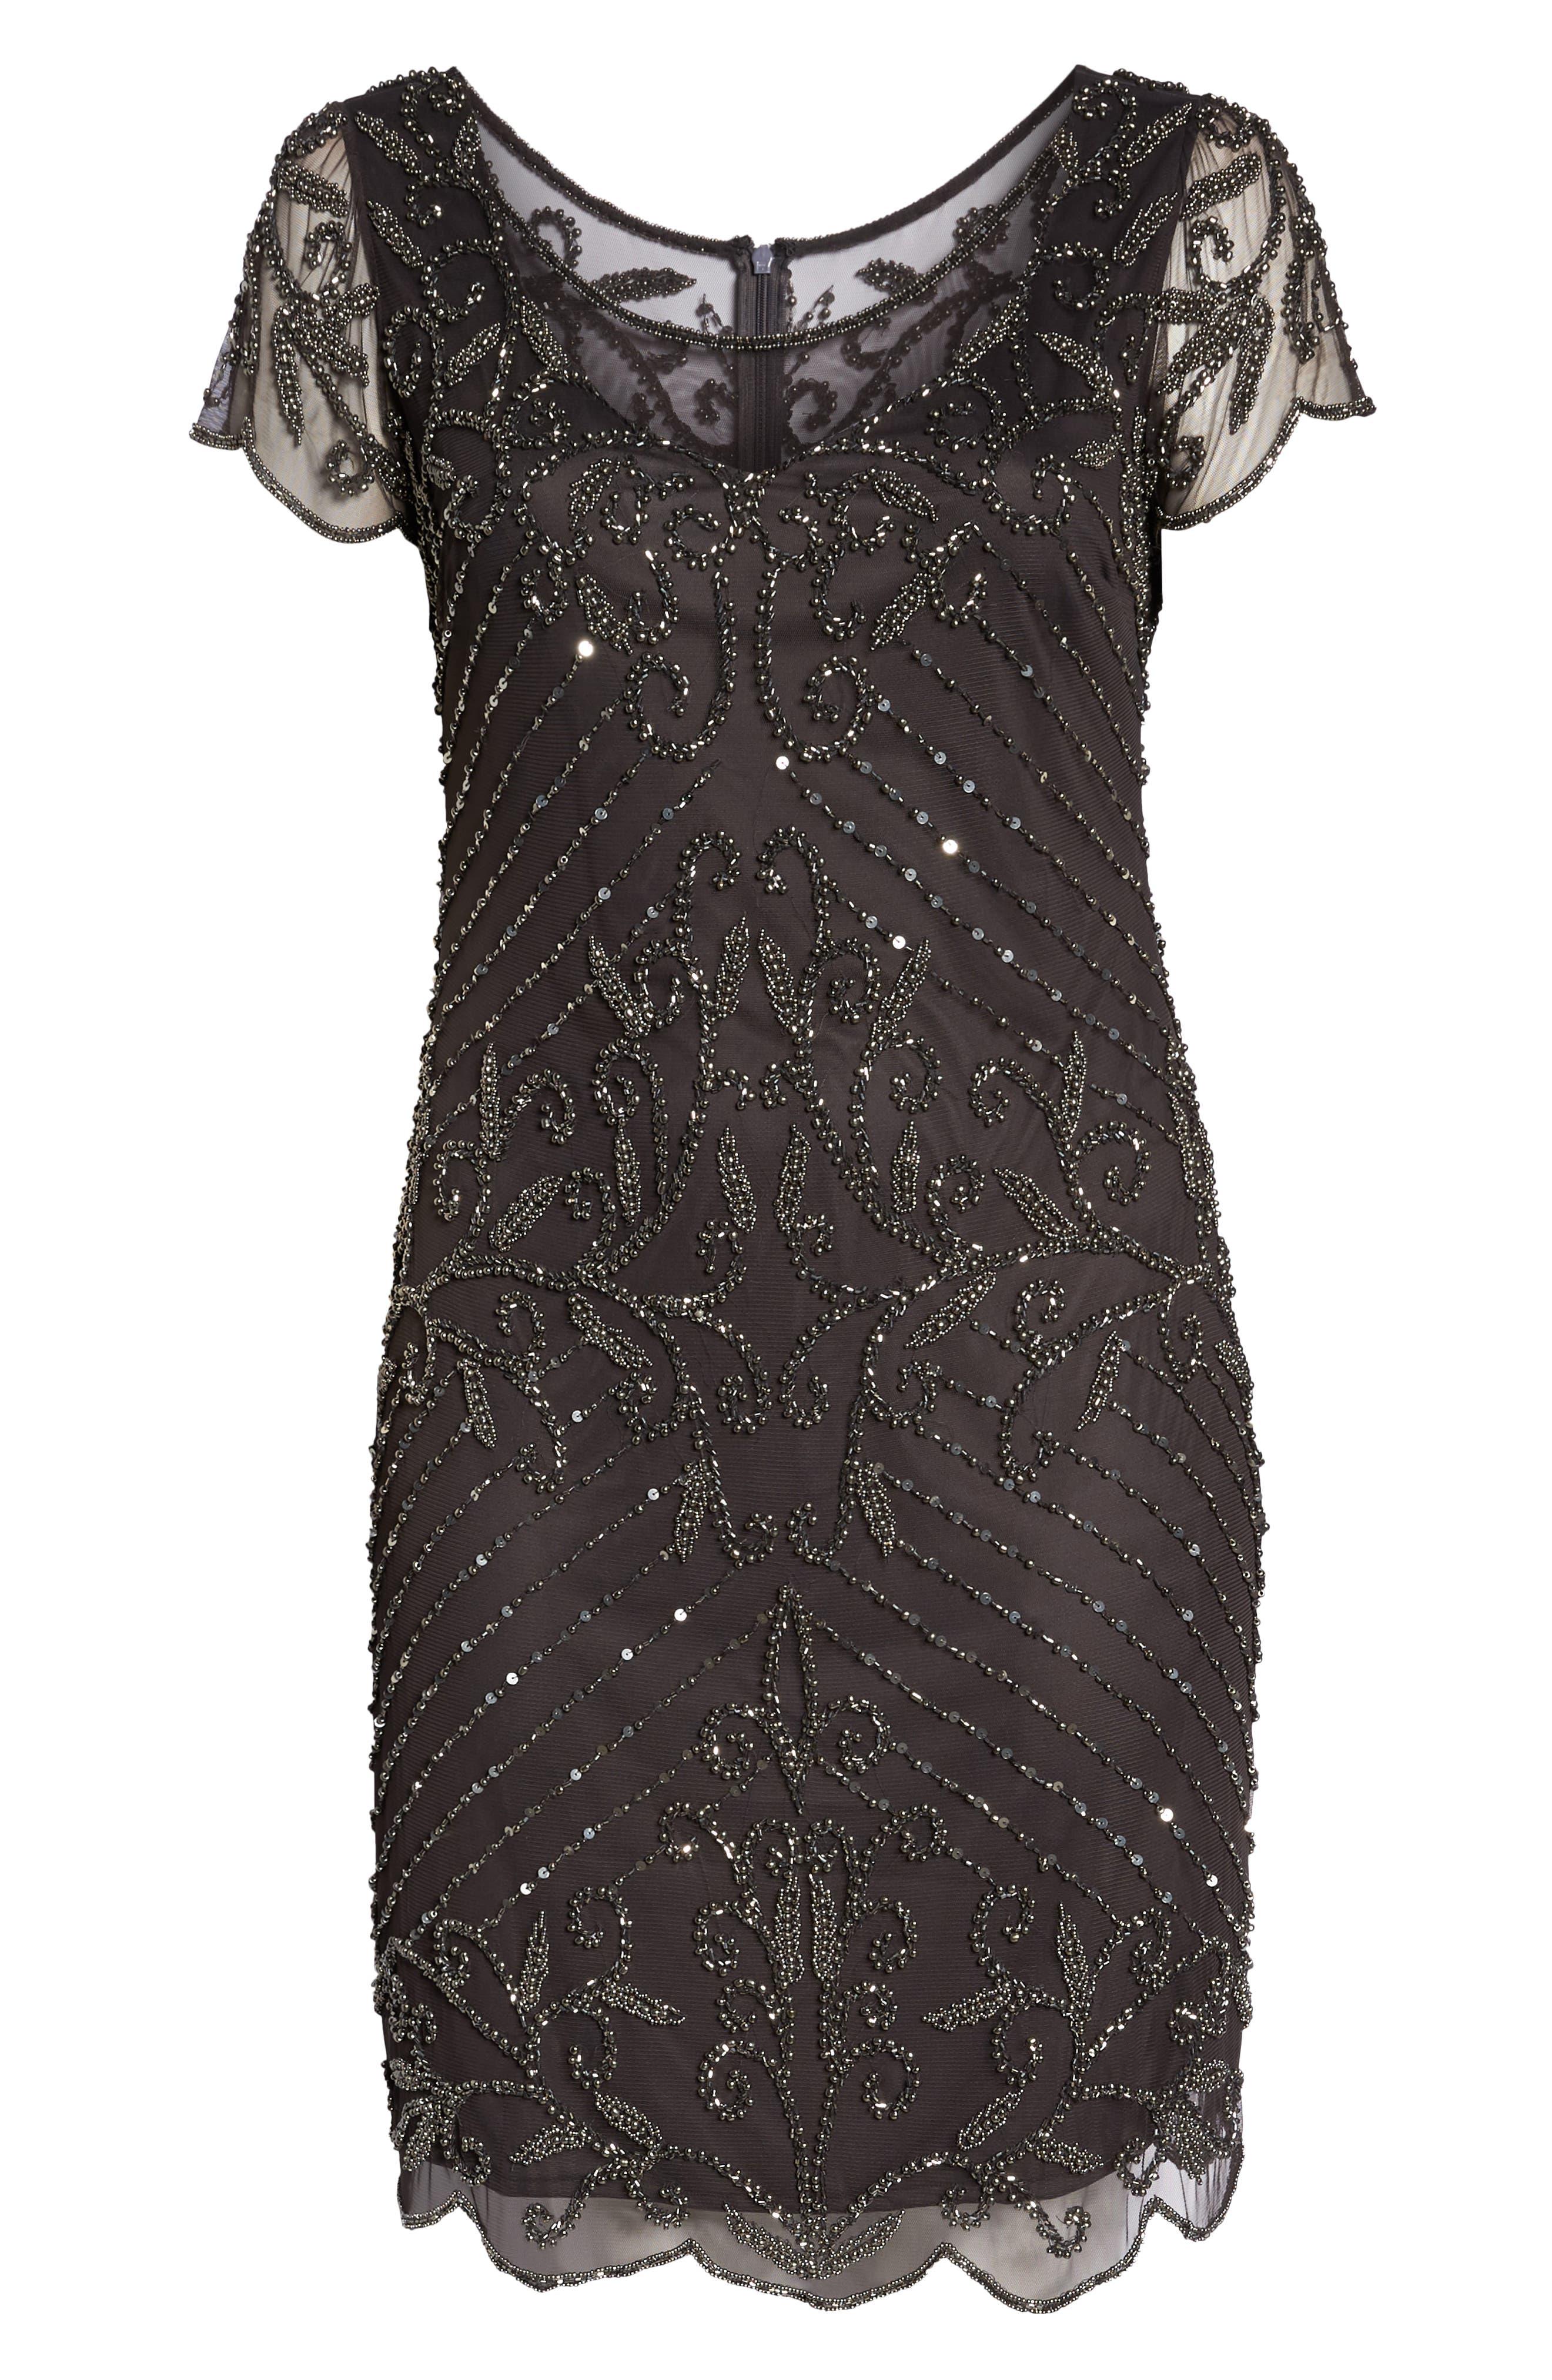 Beaded Illusion Yoke Sheath Dress,                             Alternate thumbnail 7, color,                             GRAY/ SILVER